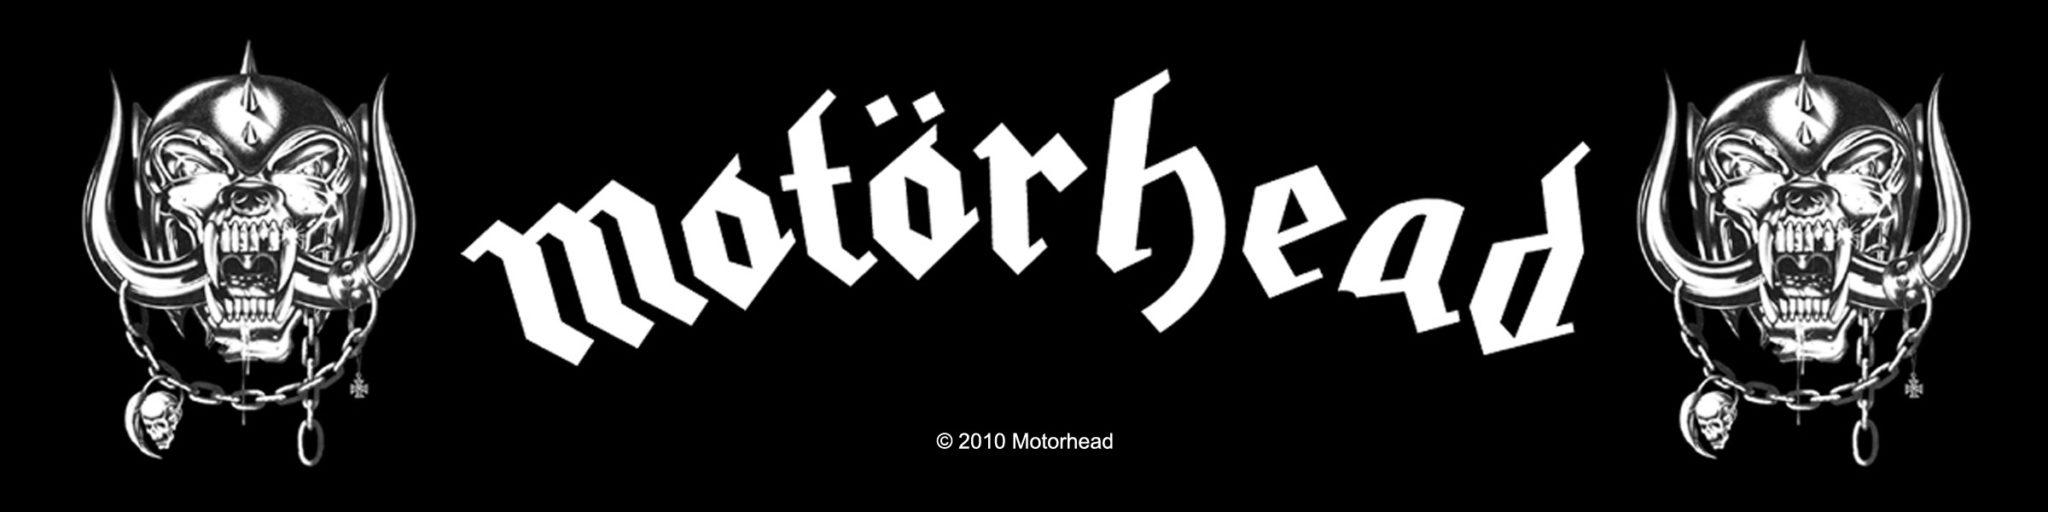 Motorhead Superstrip War Pigs